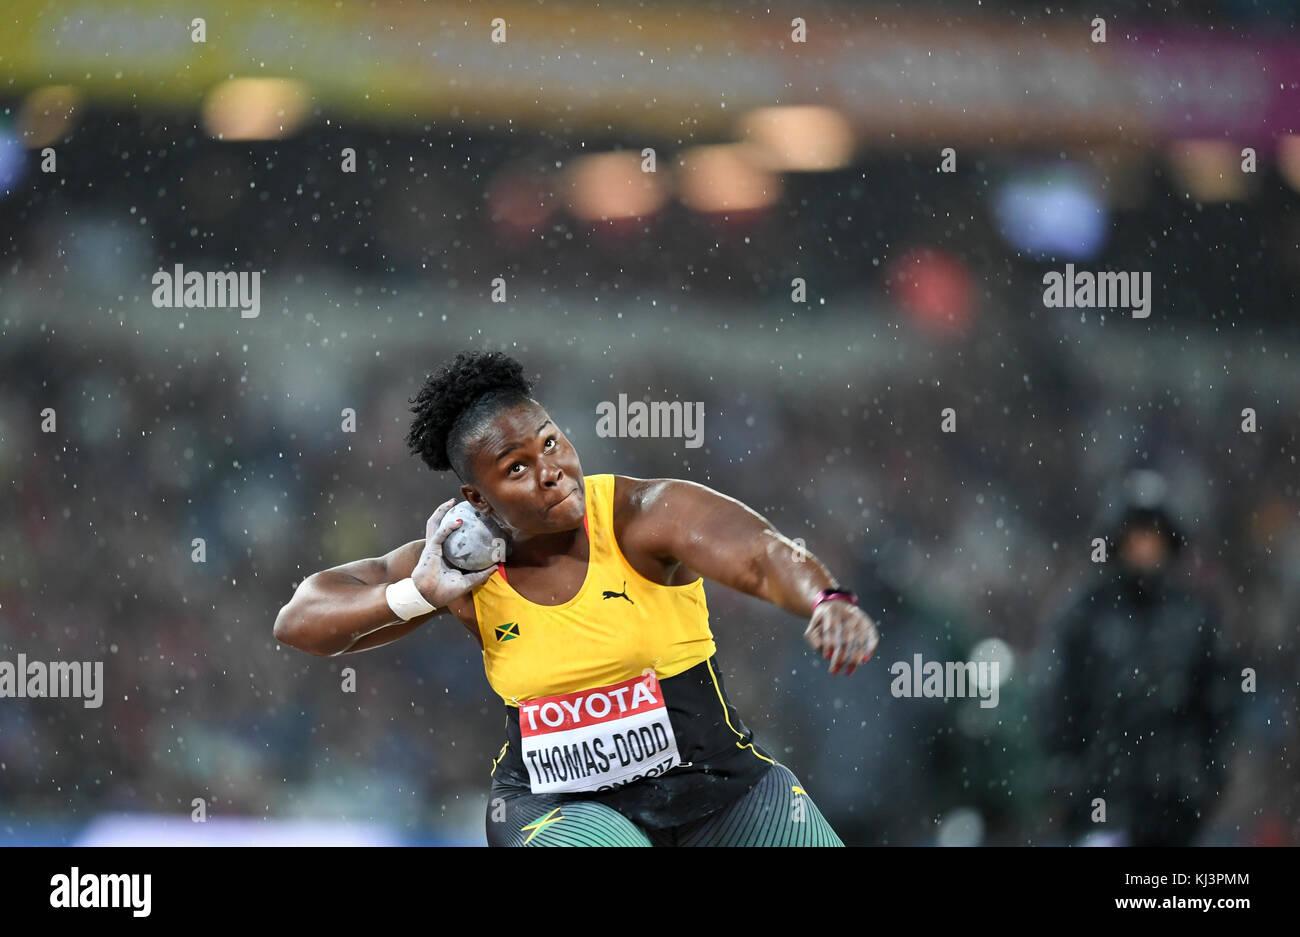 Danniel Thomas-Dodd (Jamaica) - Shot Put women - IAAF World Championships, London 2017 - Stock Image